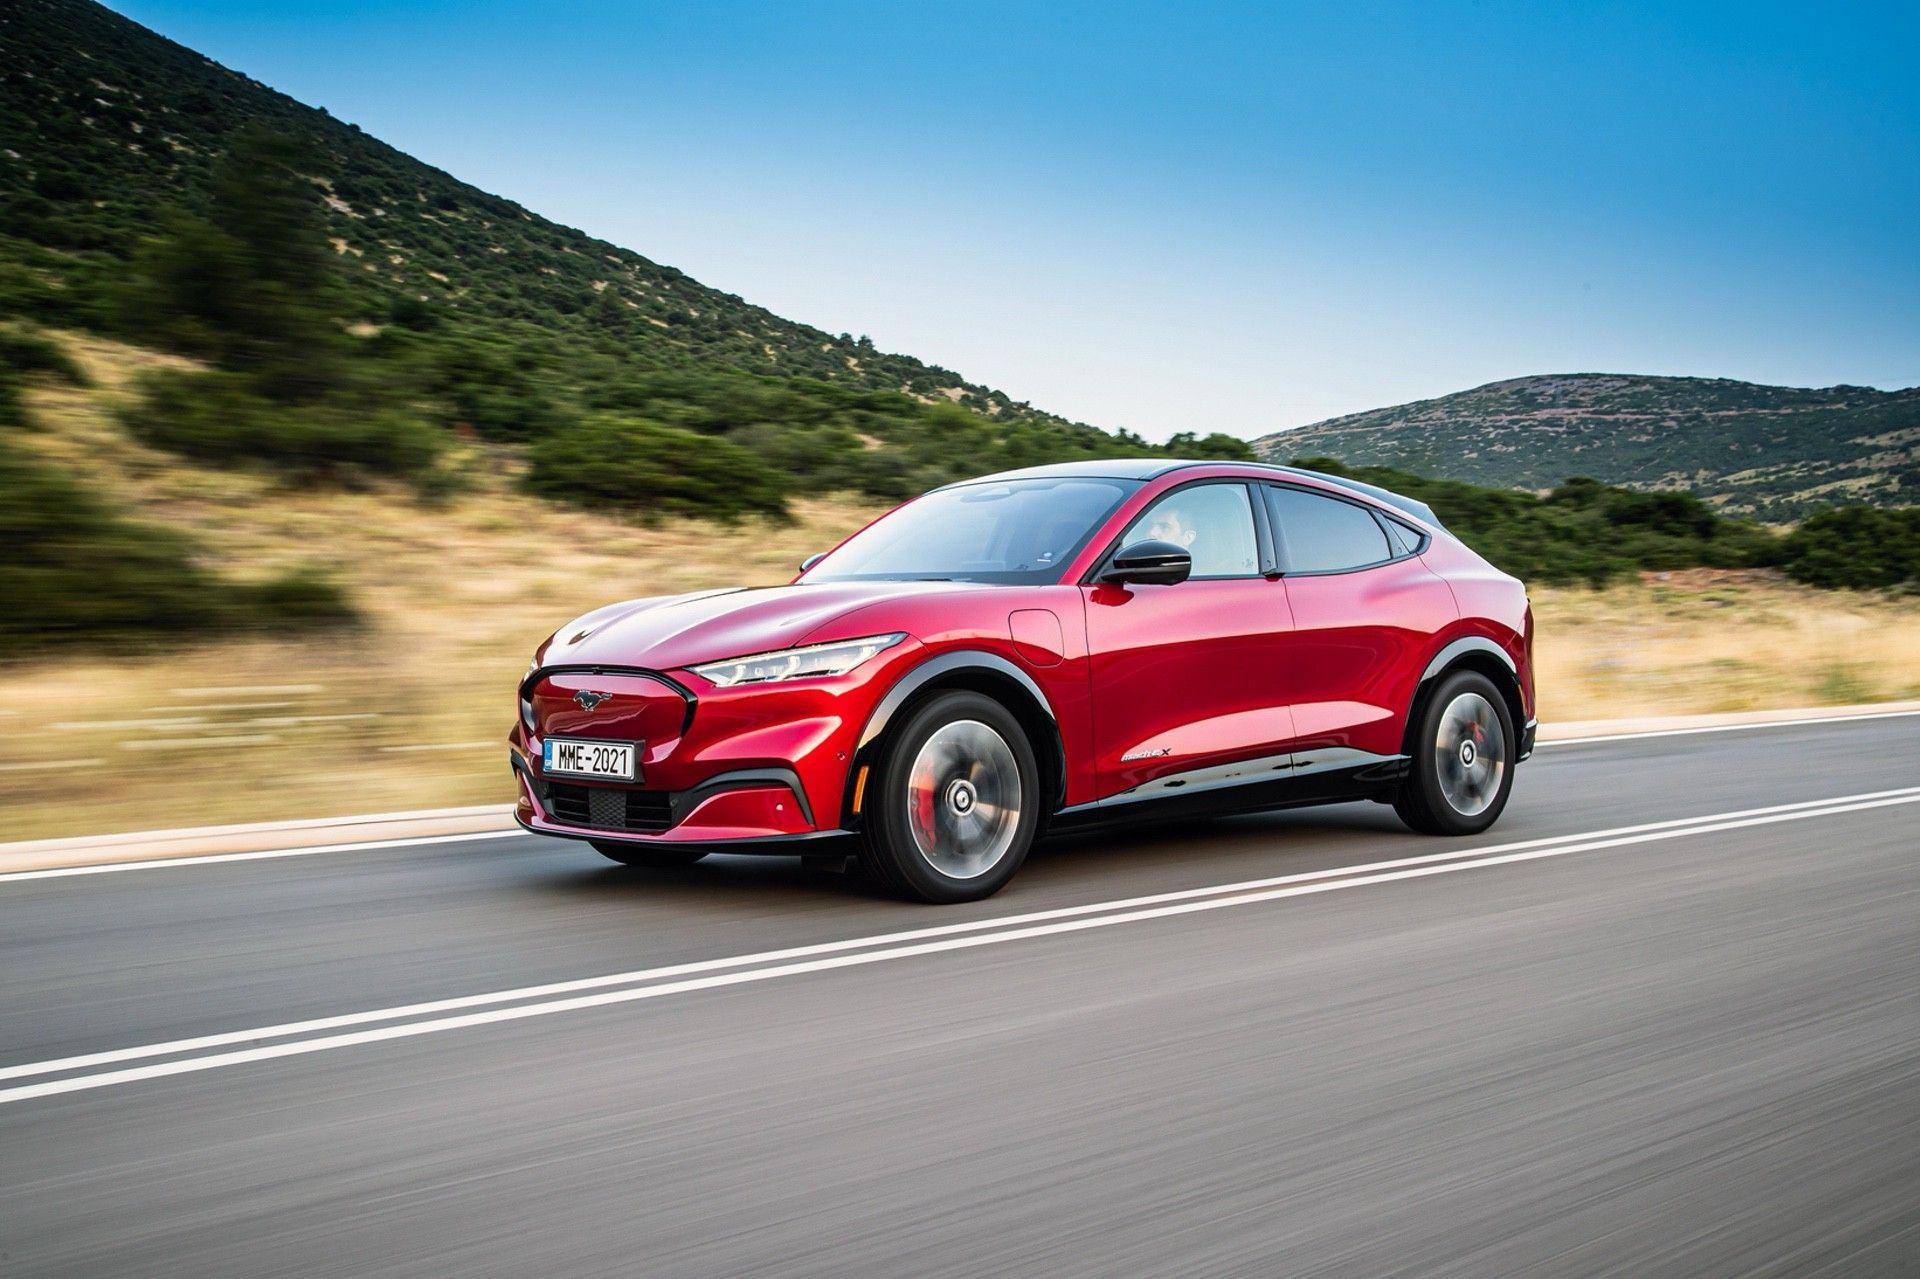 Ford_Mustang_Mach-E_greek_presskit-0102